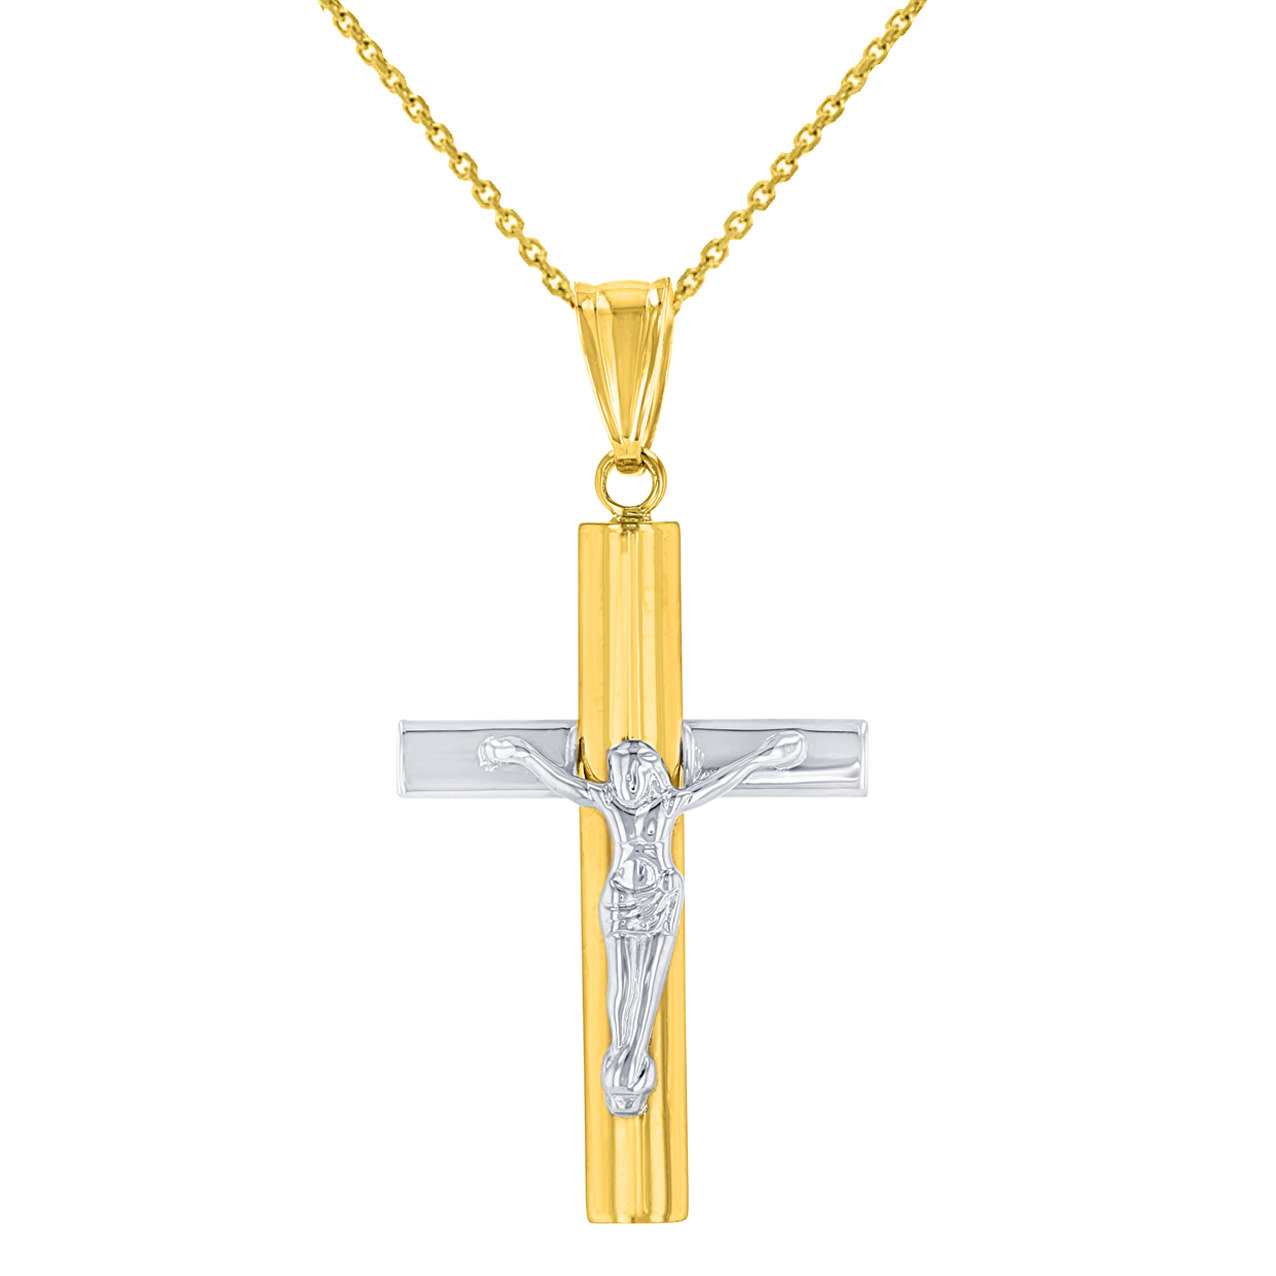 14K Yellow Gold & White Gold Cross Pendant